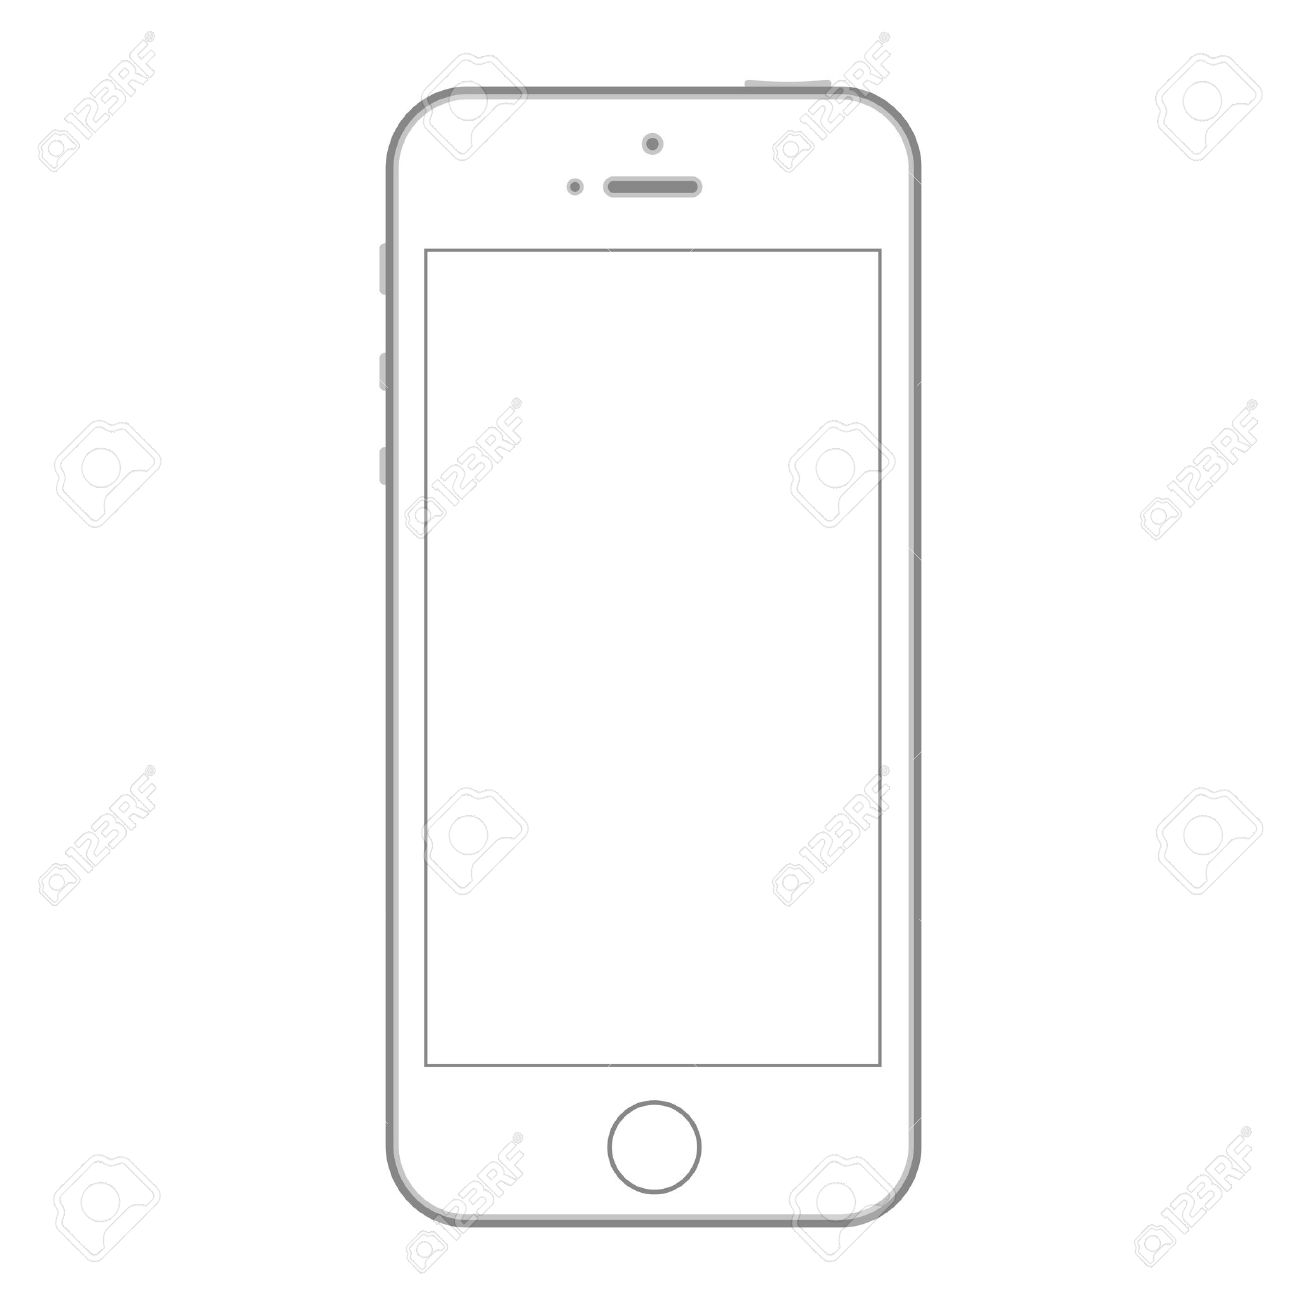 Mobile Phone Mockup Design Template Outline Shape Royalty Free ...